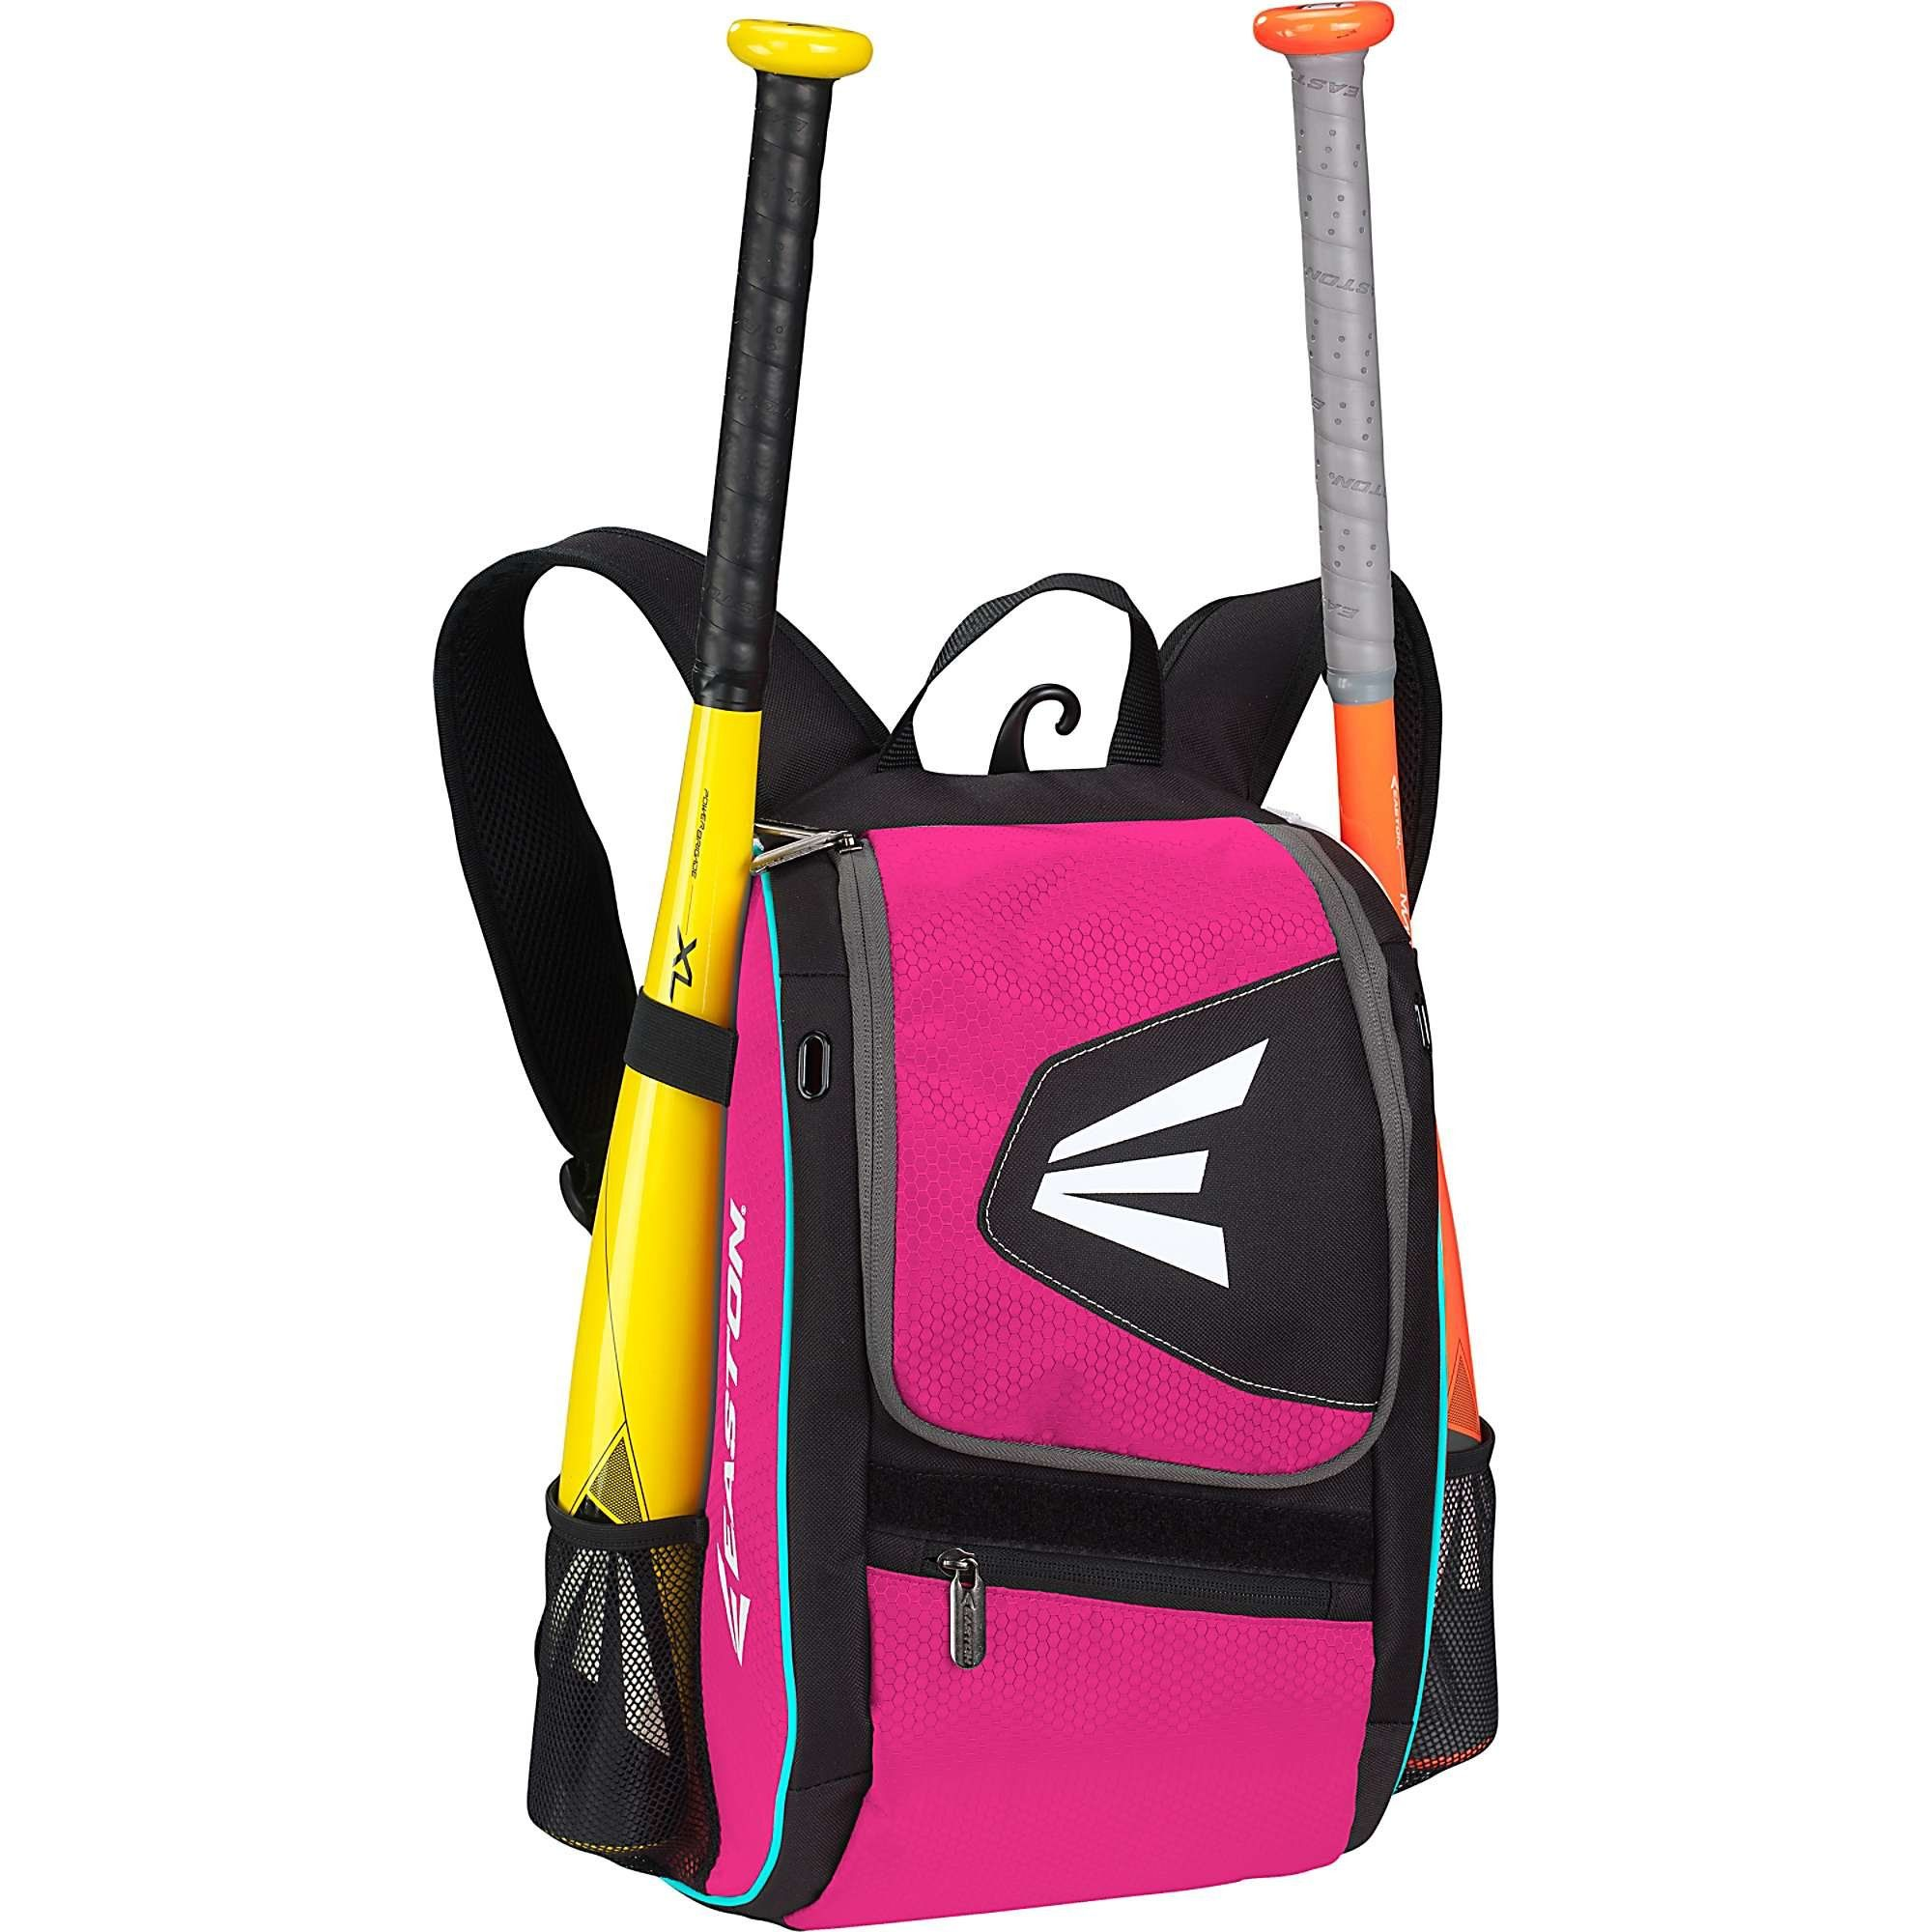 Easton E100P Bat Pack, Black/Pink Softball bags